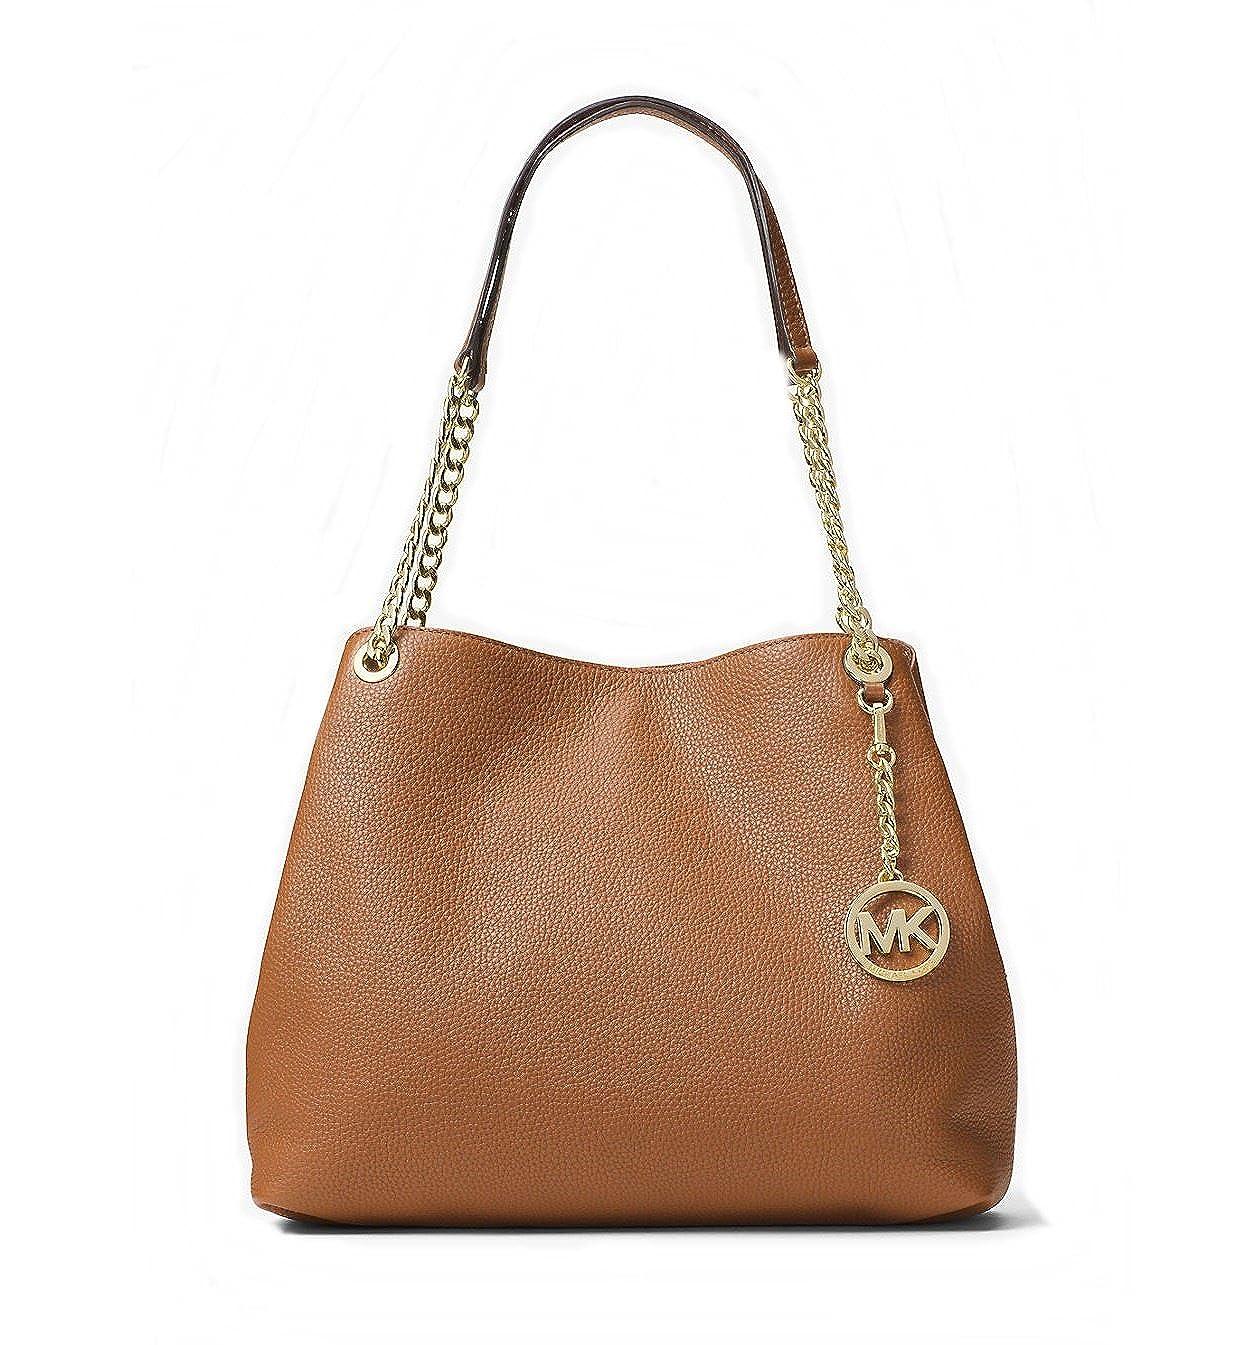 4b702f046848 Amazon.com  Michael Kors Jet Set Chain Item Large Leather Shoulder Bag  (Luggage)  Clothing